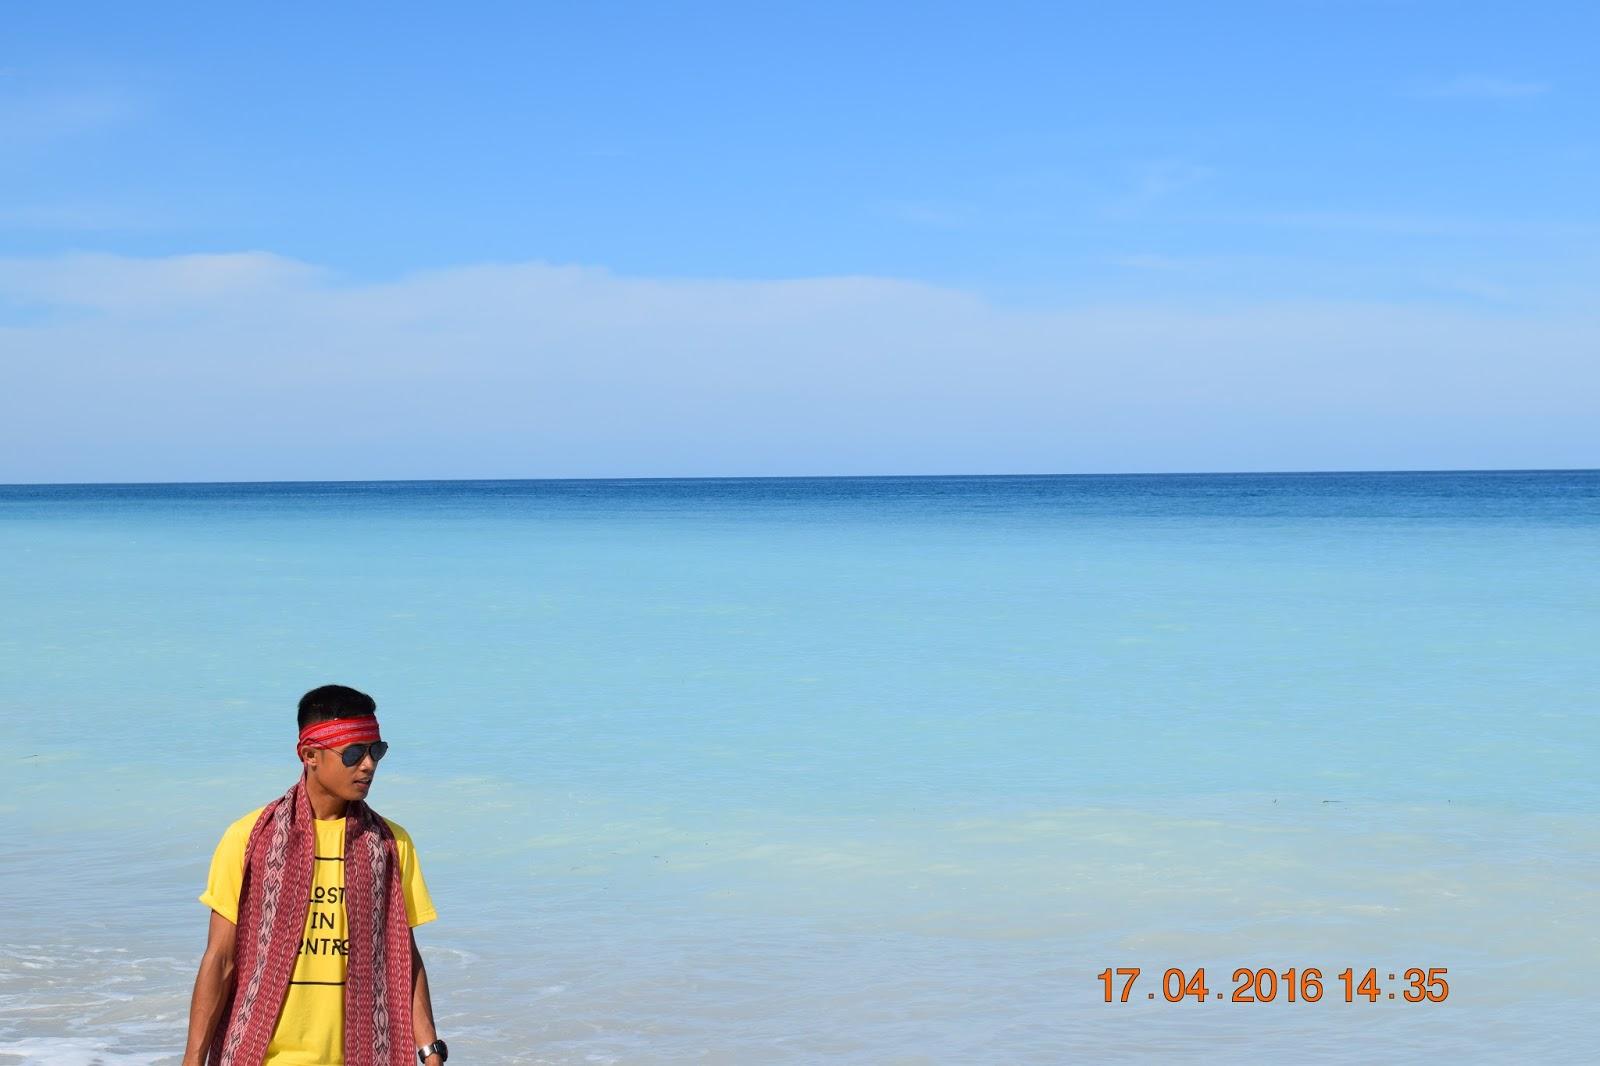 Arianto Ntt Pantai Kolbano Kabupaten Tts Lebih 4 Jam Perjalanan